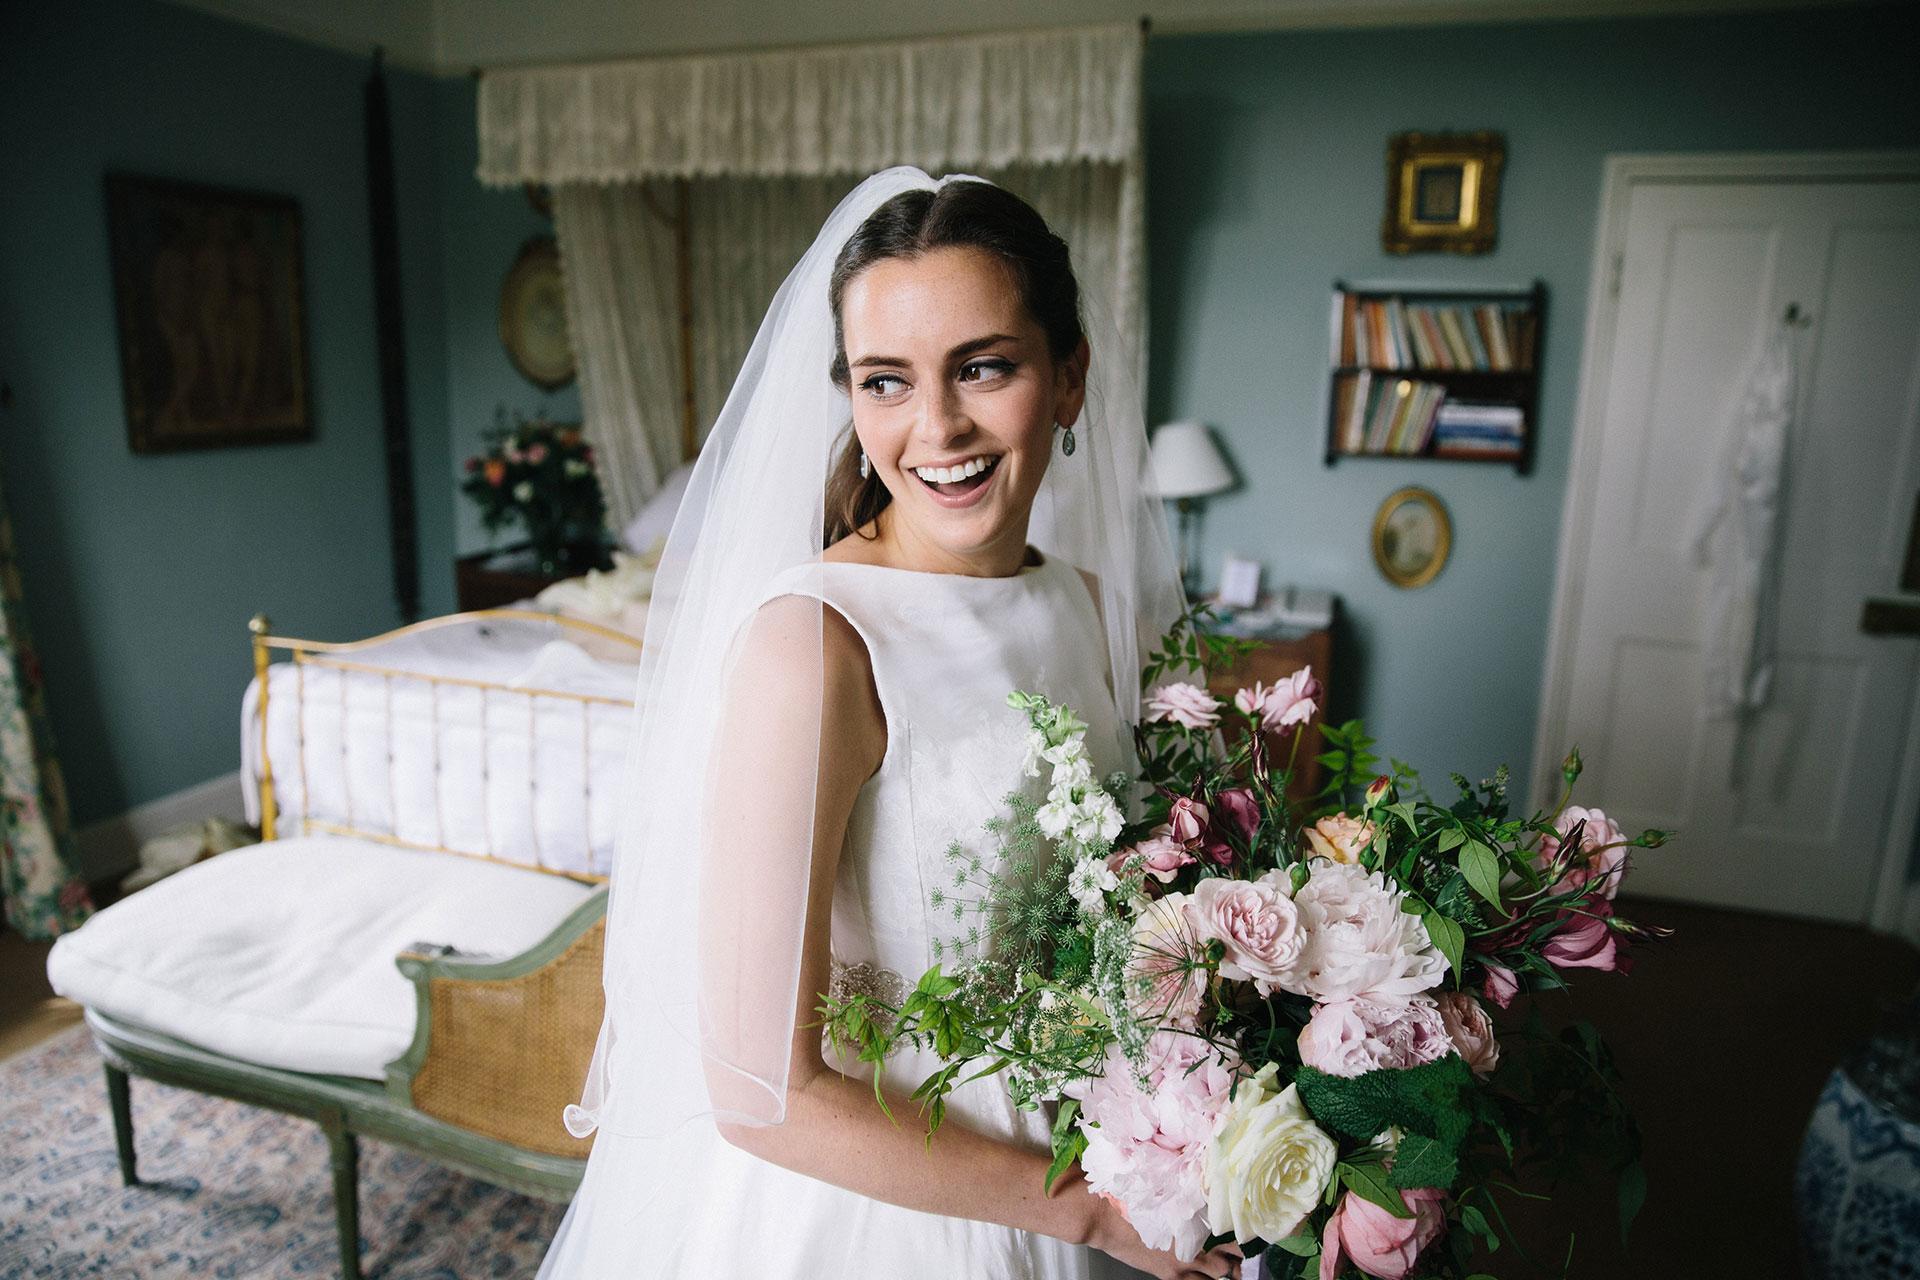 Langar-Hall-wedding-photographer-in-Nottinghamshire-Michael-Newington-Gray-22.jpg